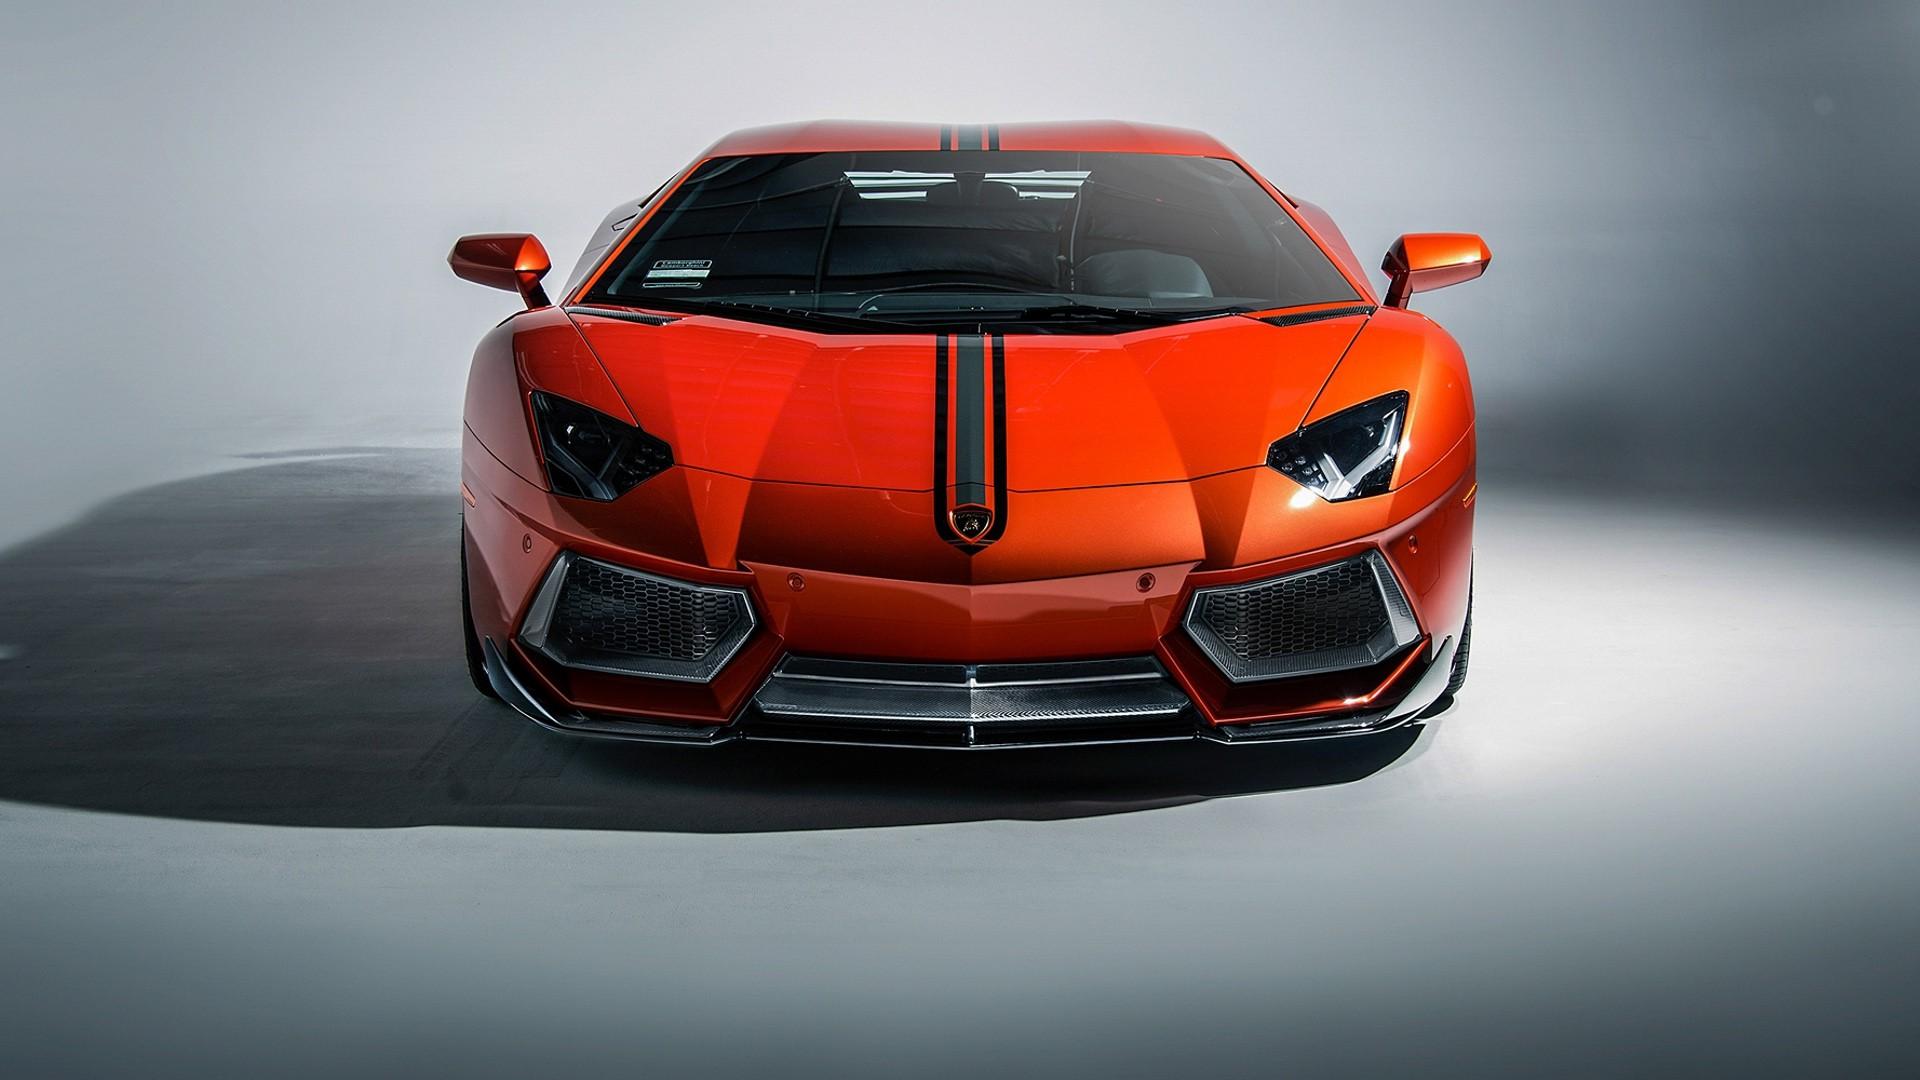 2015 Vorsteiner Lamborghini Aventador Coupe 3 Wallpaper ...